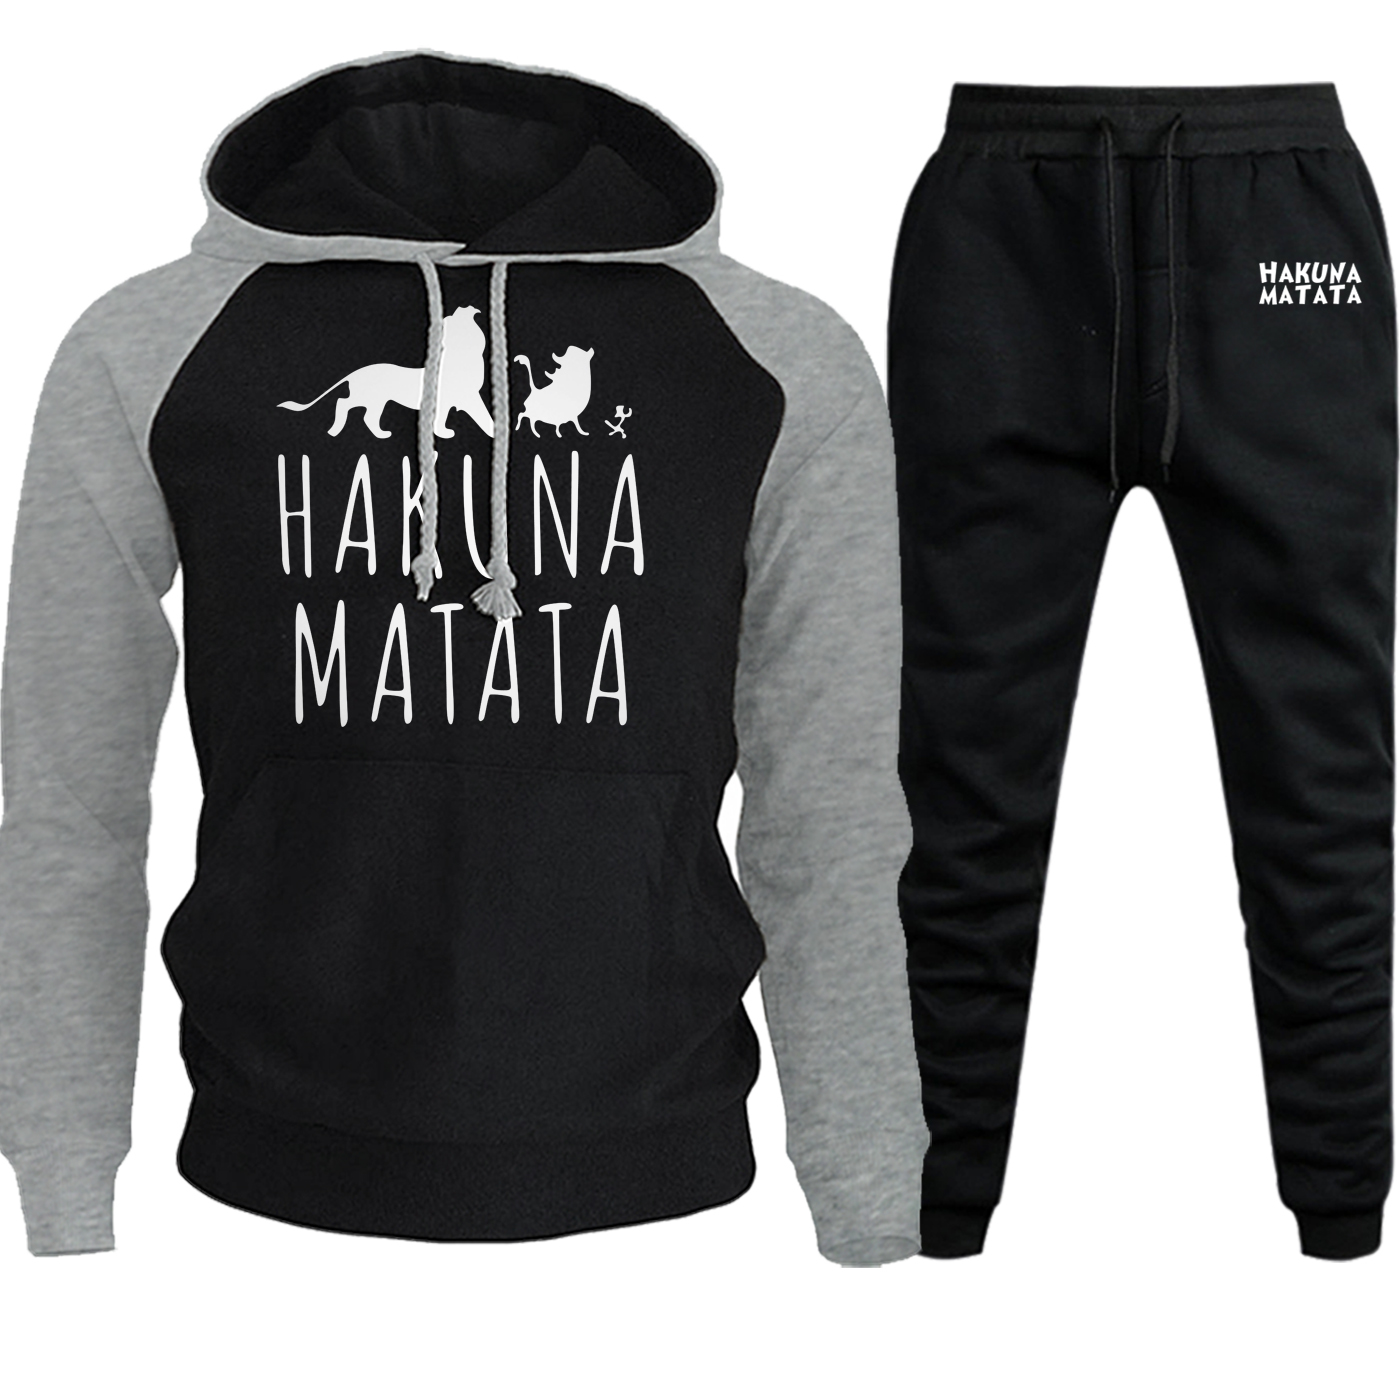 The Lion King Streetwear 2019 Autumn Winter Raglan Men Hoodie Cartoon Suit Male Pullover Casual Fleece Hooded+Pants 2 Piece Set